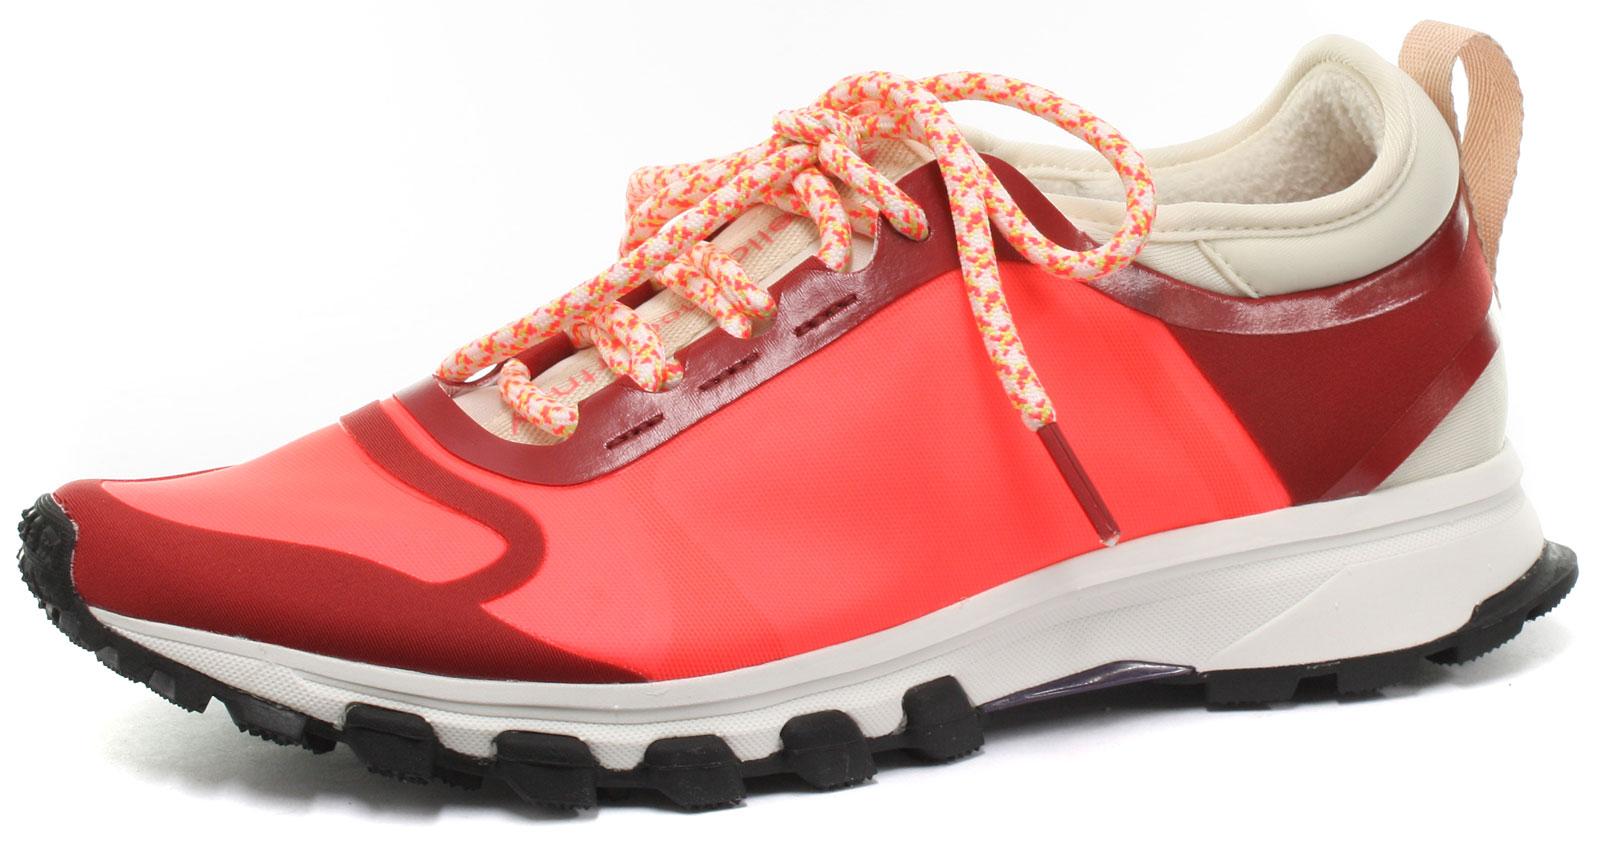 adidas stella mccartney xt adizero 2 womens running shoes all sizes ebay. Black Bedroom Furniture Sets. Home Design Ideas